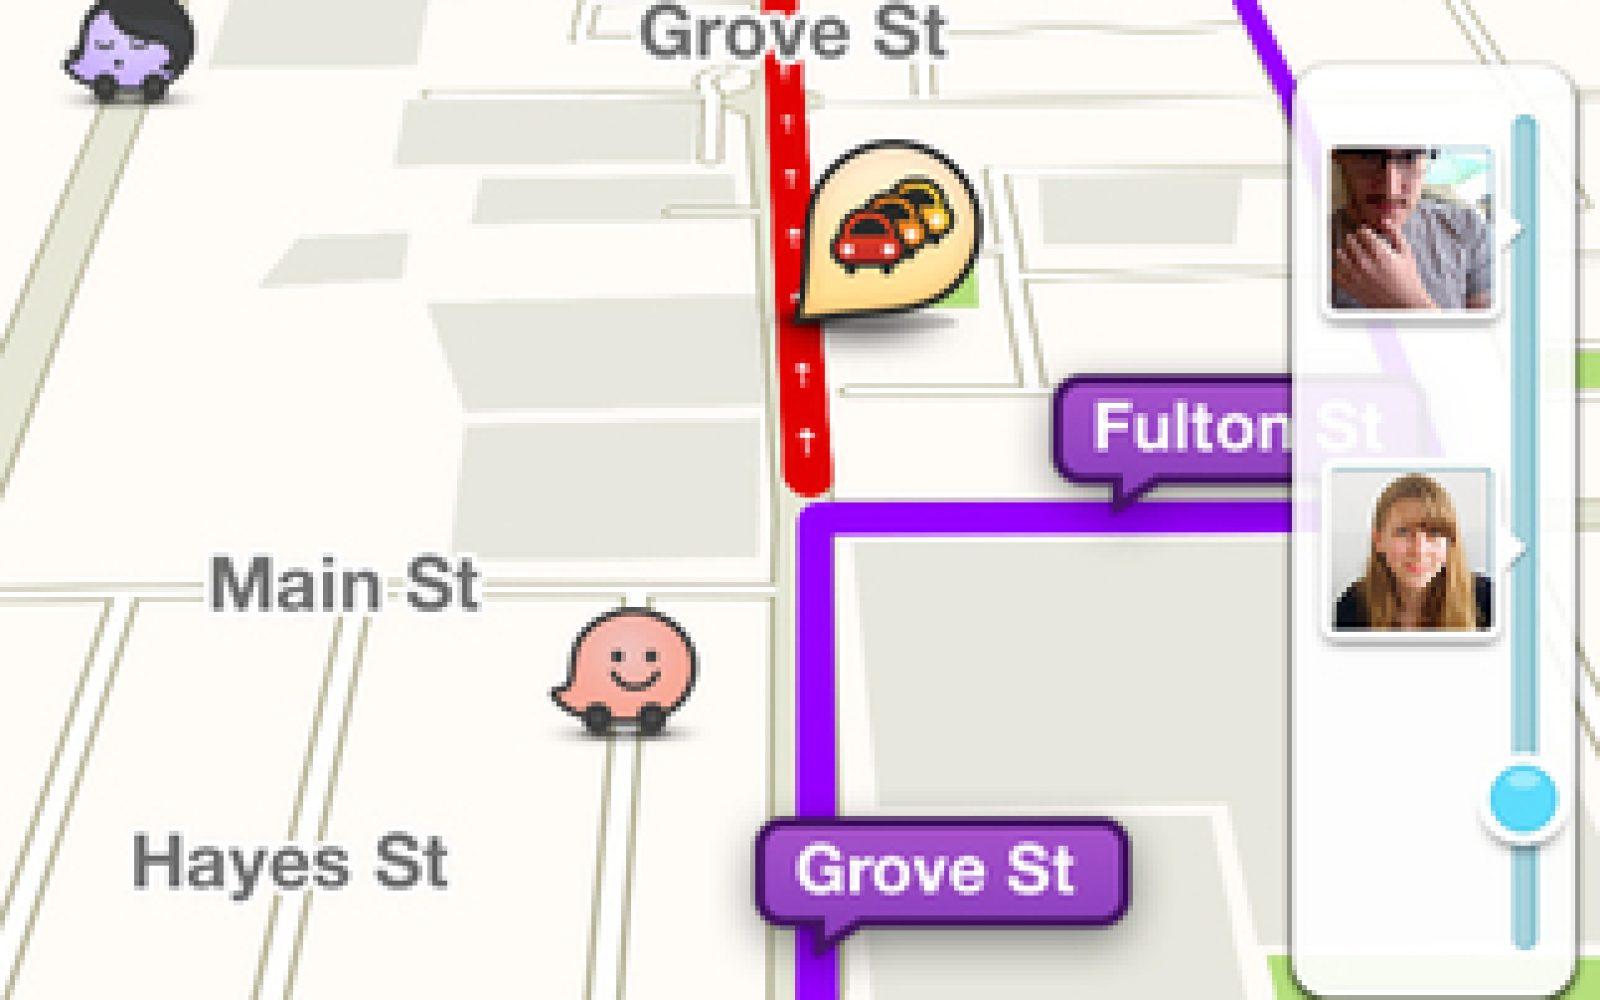 Waze app now automatically remembers where you park - 9to5Mac